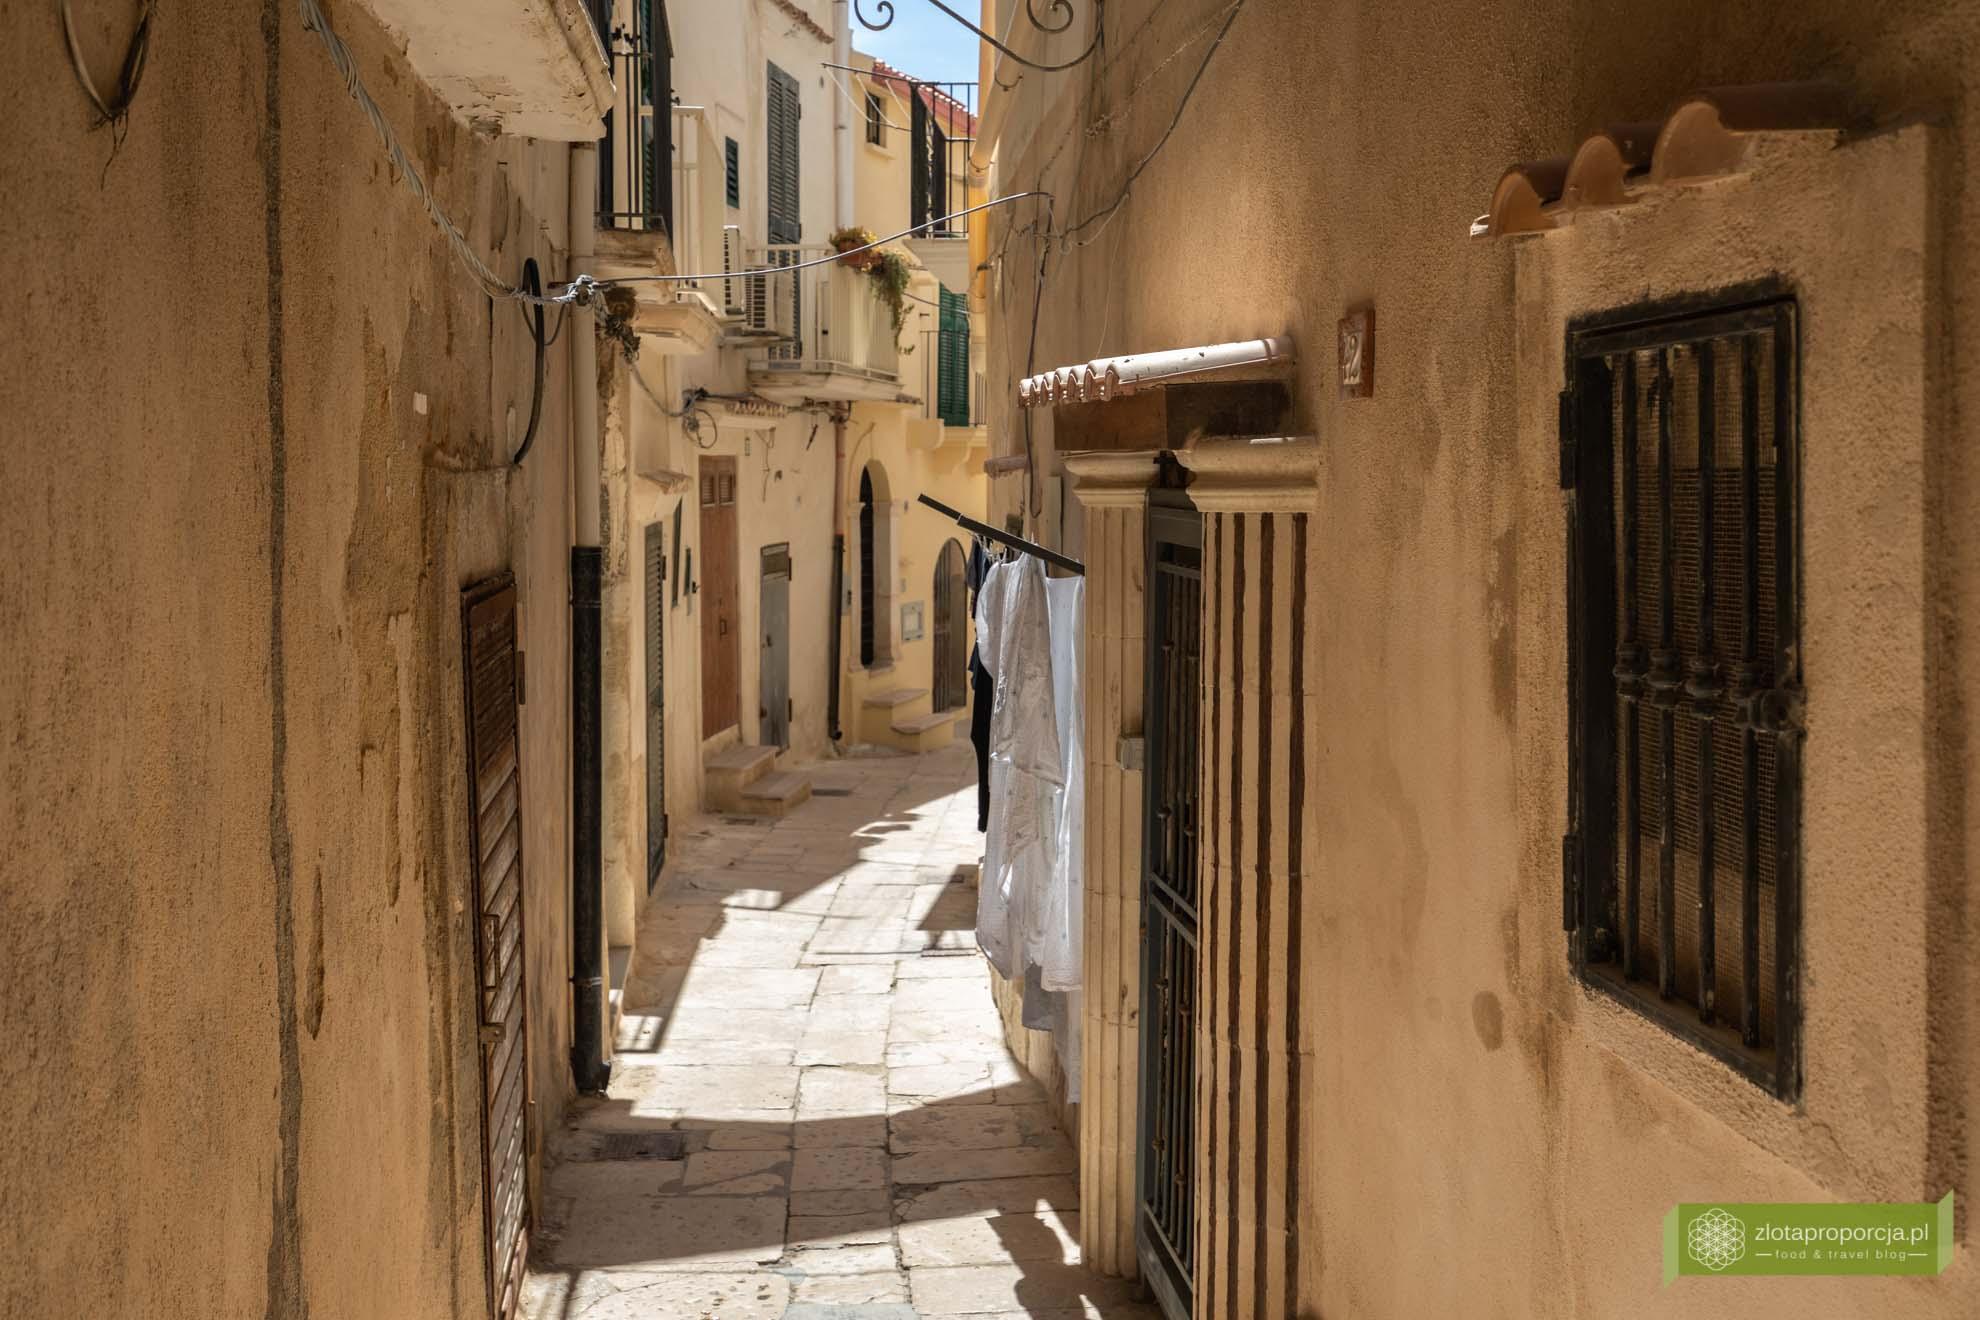 Vieste; Gargano; Apulia; atrakcje Gargano; Vieste Gargano, co zobaczyć na Gargano; uliczki Vieste; centro storico Vieste; atrakcje Apulii;